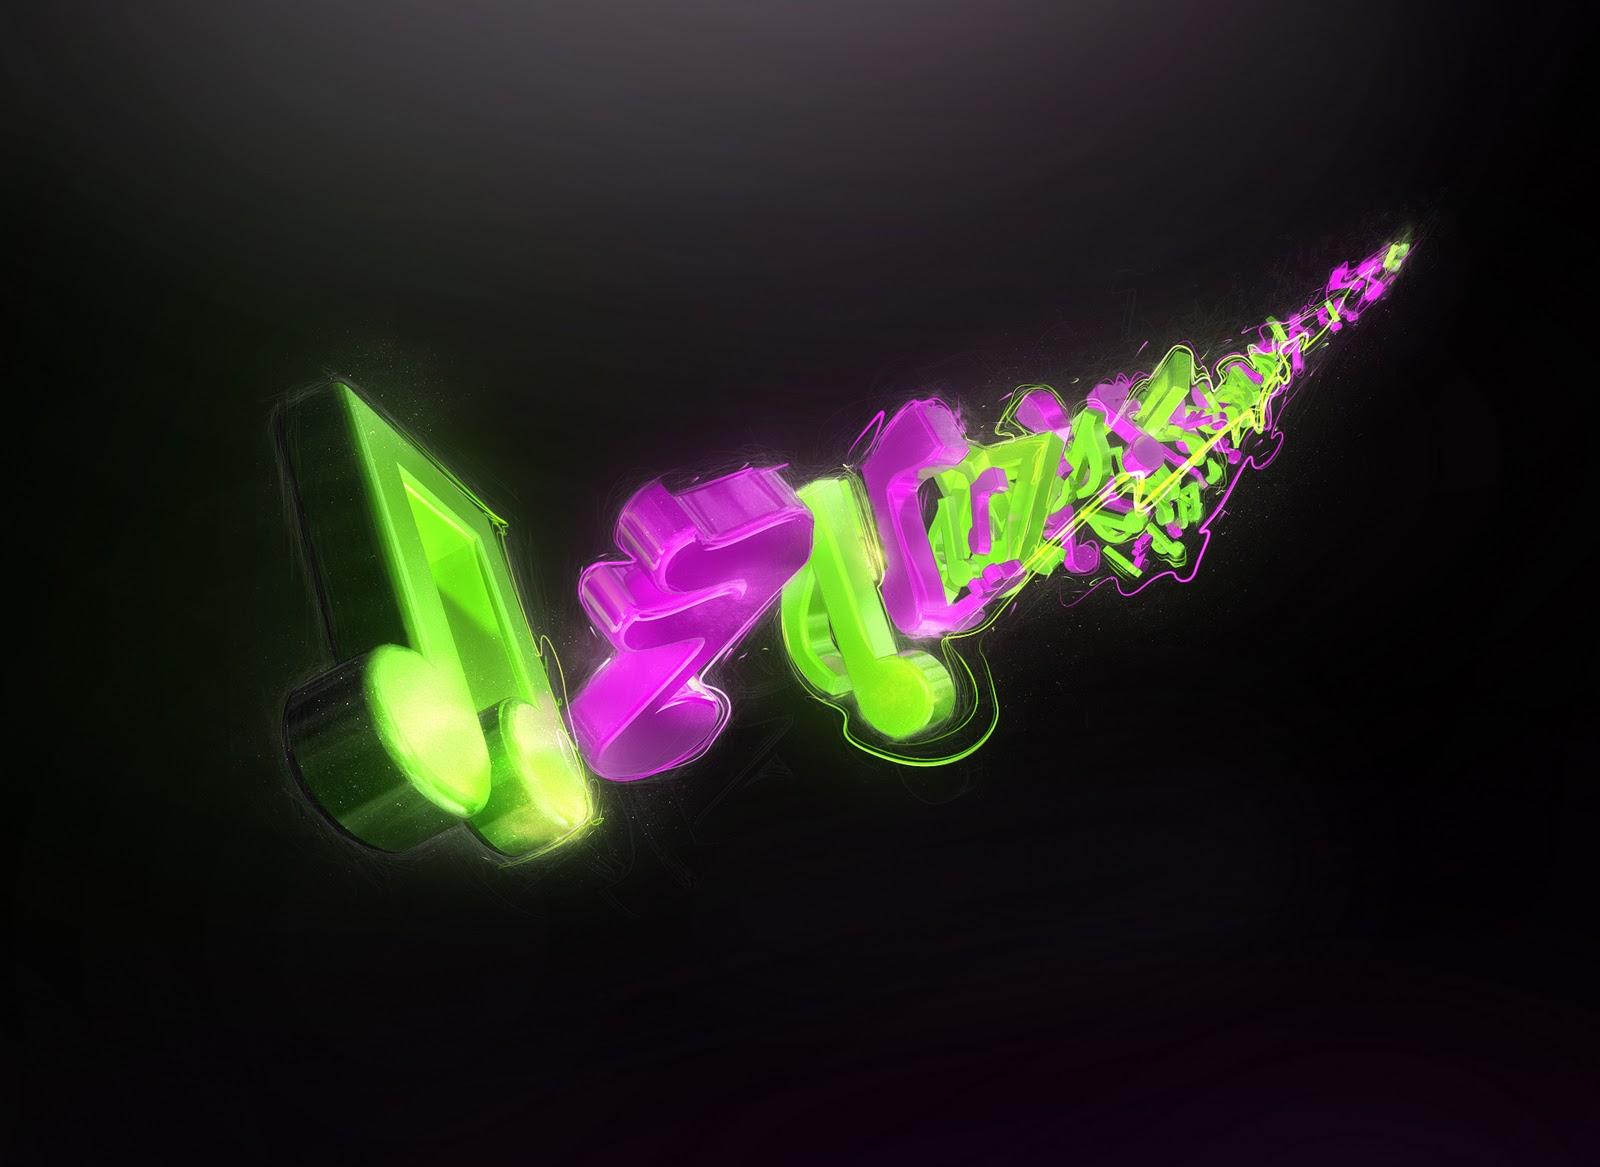 http://3.bp.blogspot.com/-ZTtw6vazYu0/Tu4d9iOVGfI/AAAAAAAAGa0/52MZkhl34n8/s1600/graphics-music-notes-435227.jpg